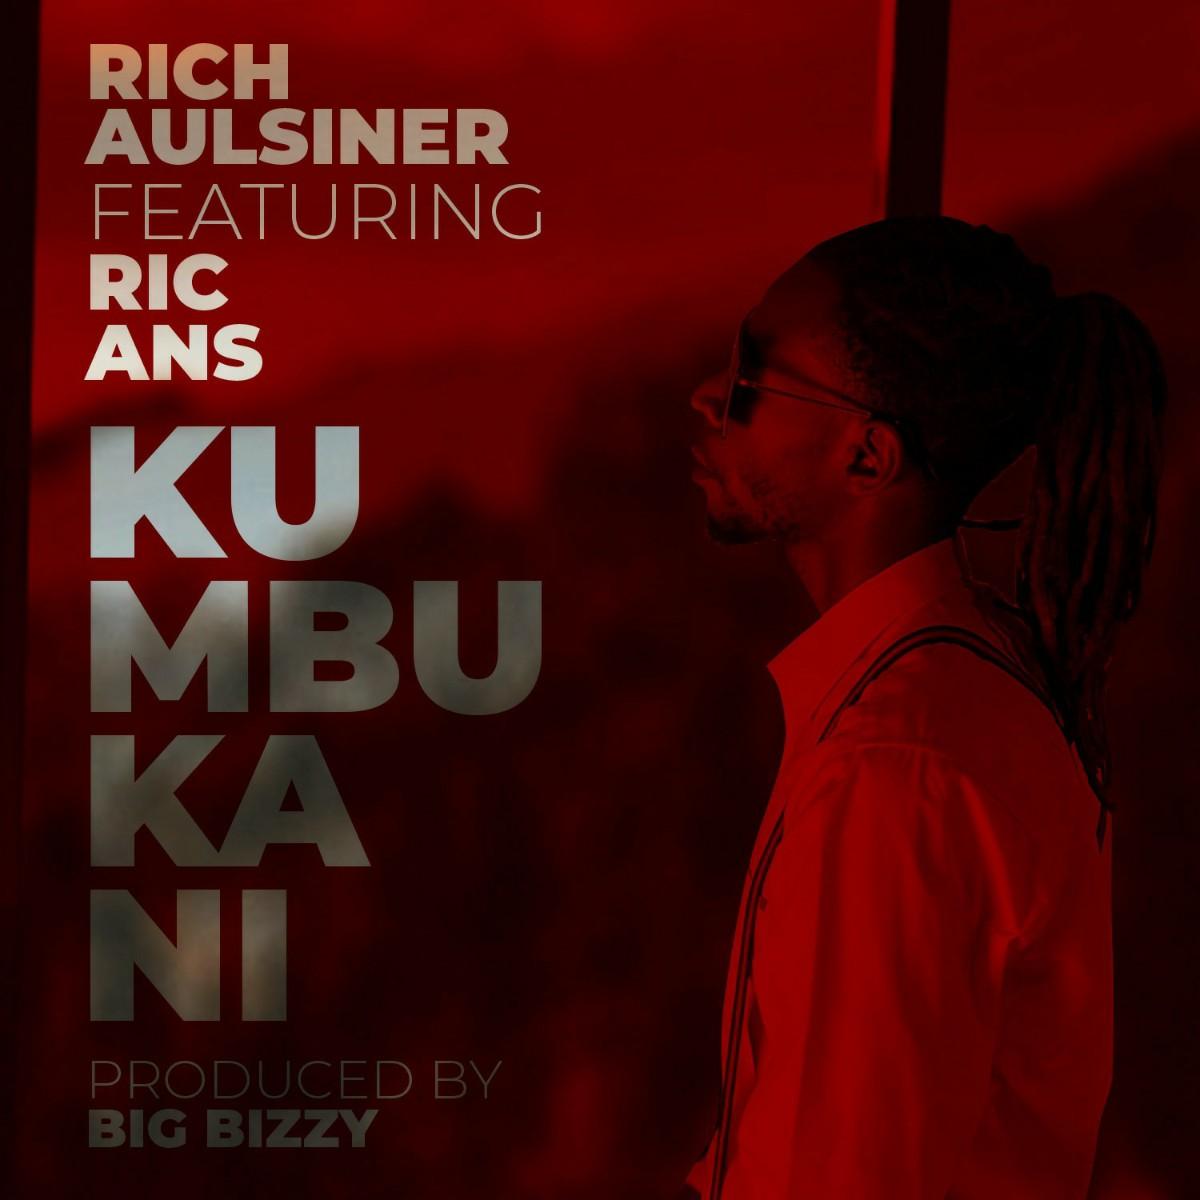 Rich Aulsiner ft. Ric Ans - Kumbukani (Prod. Big Bizzy)